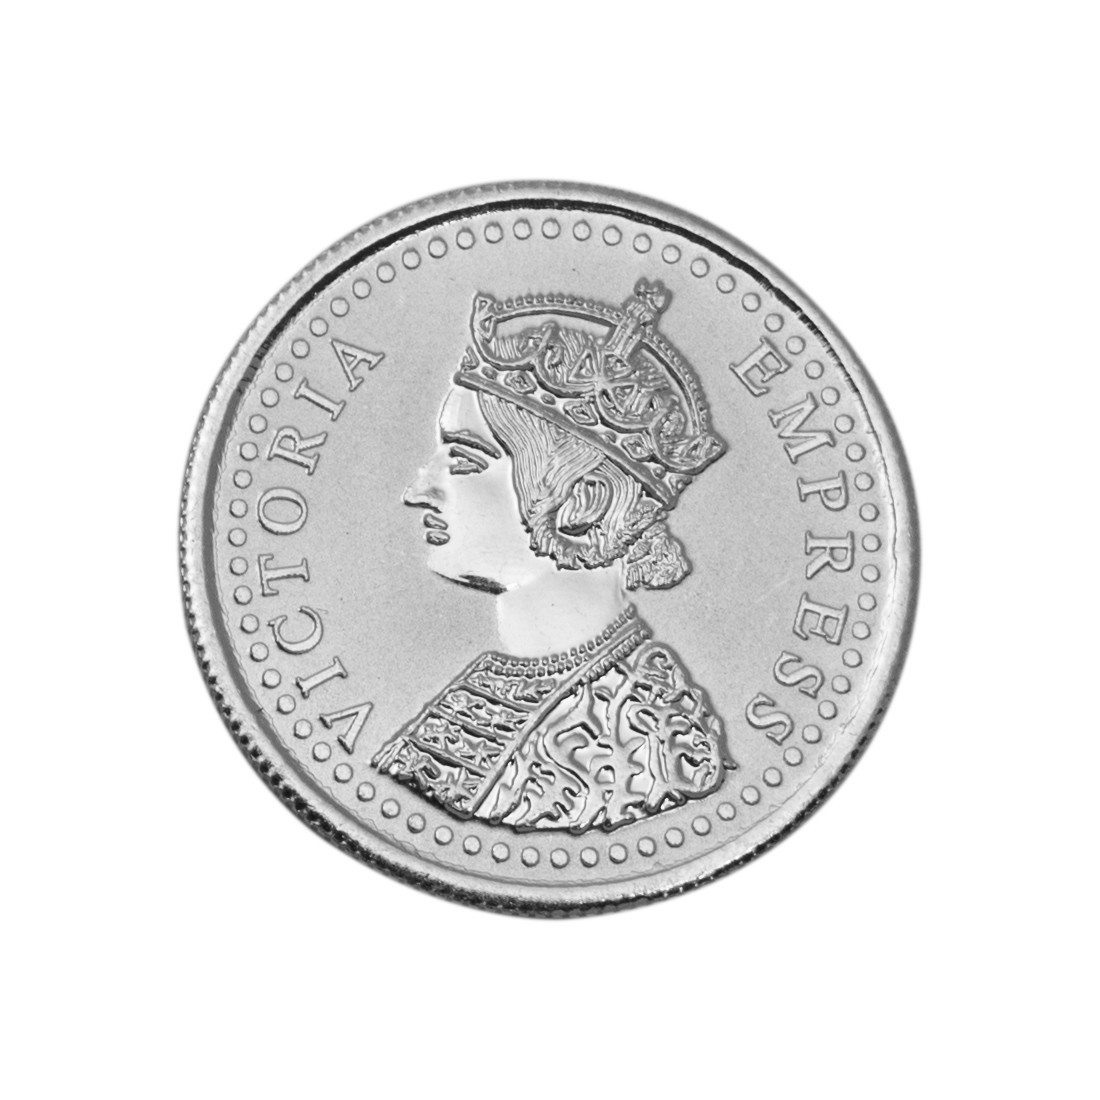 Buy Victoria Queen Silver Coin Of 2 Gram In 999 Purity